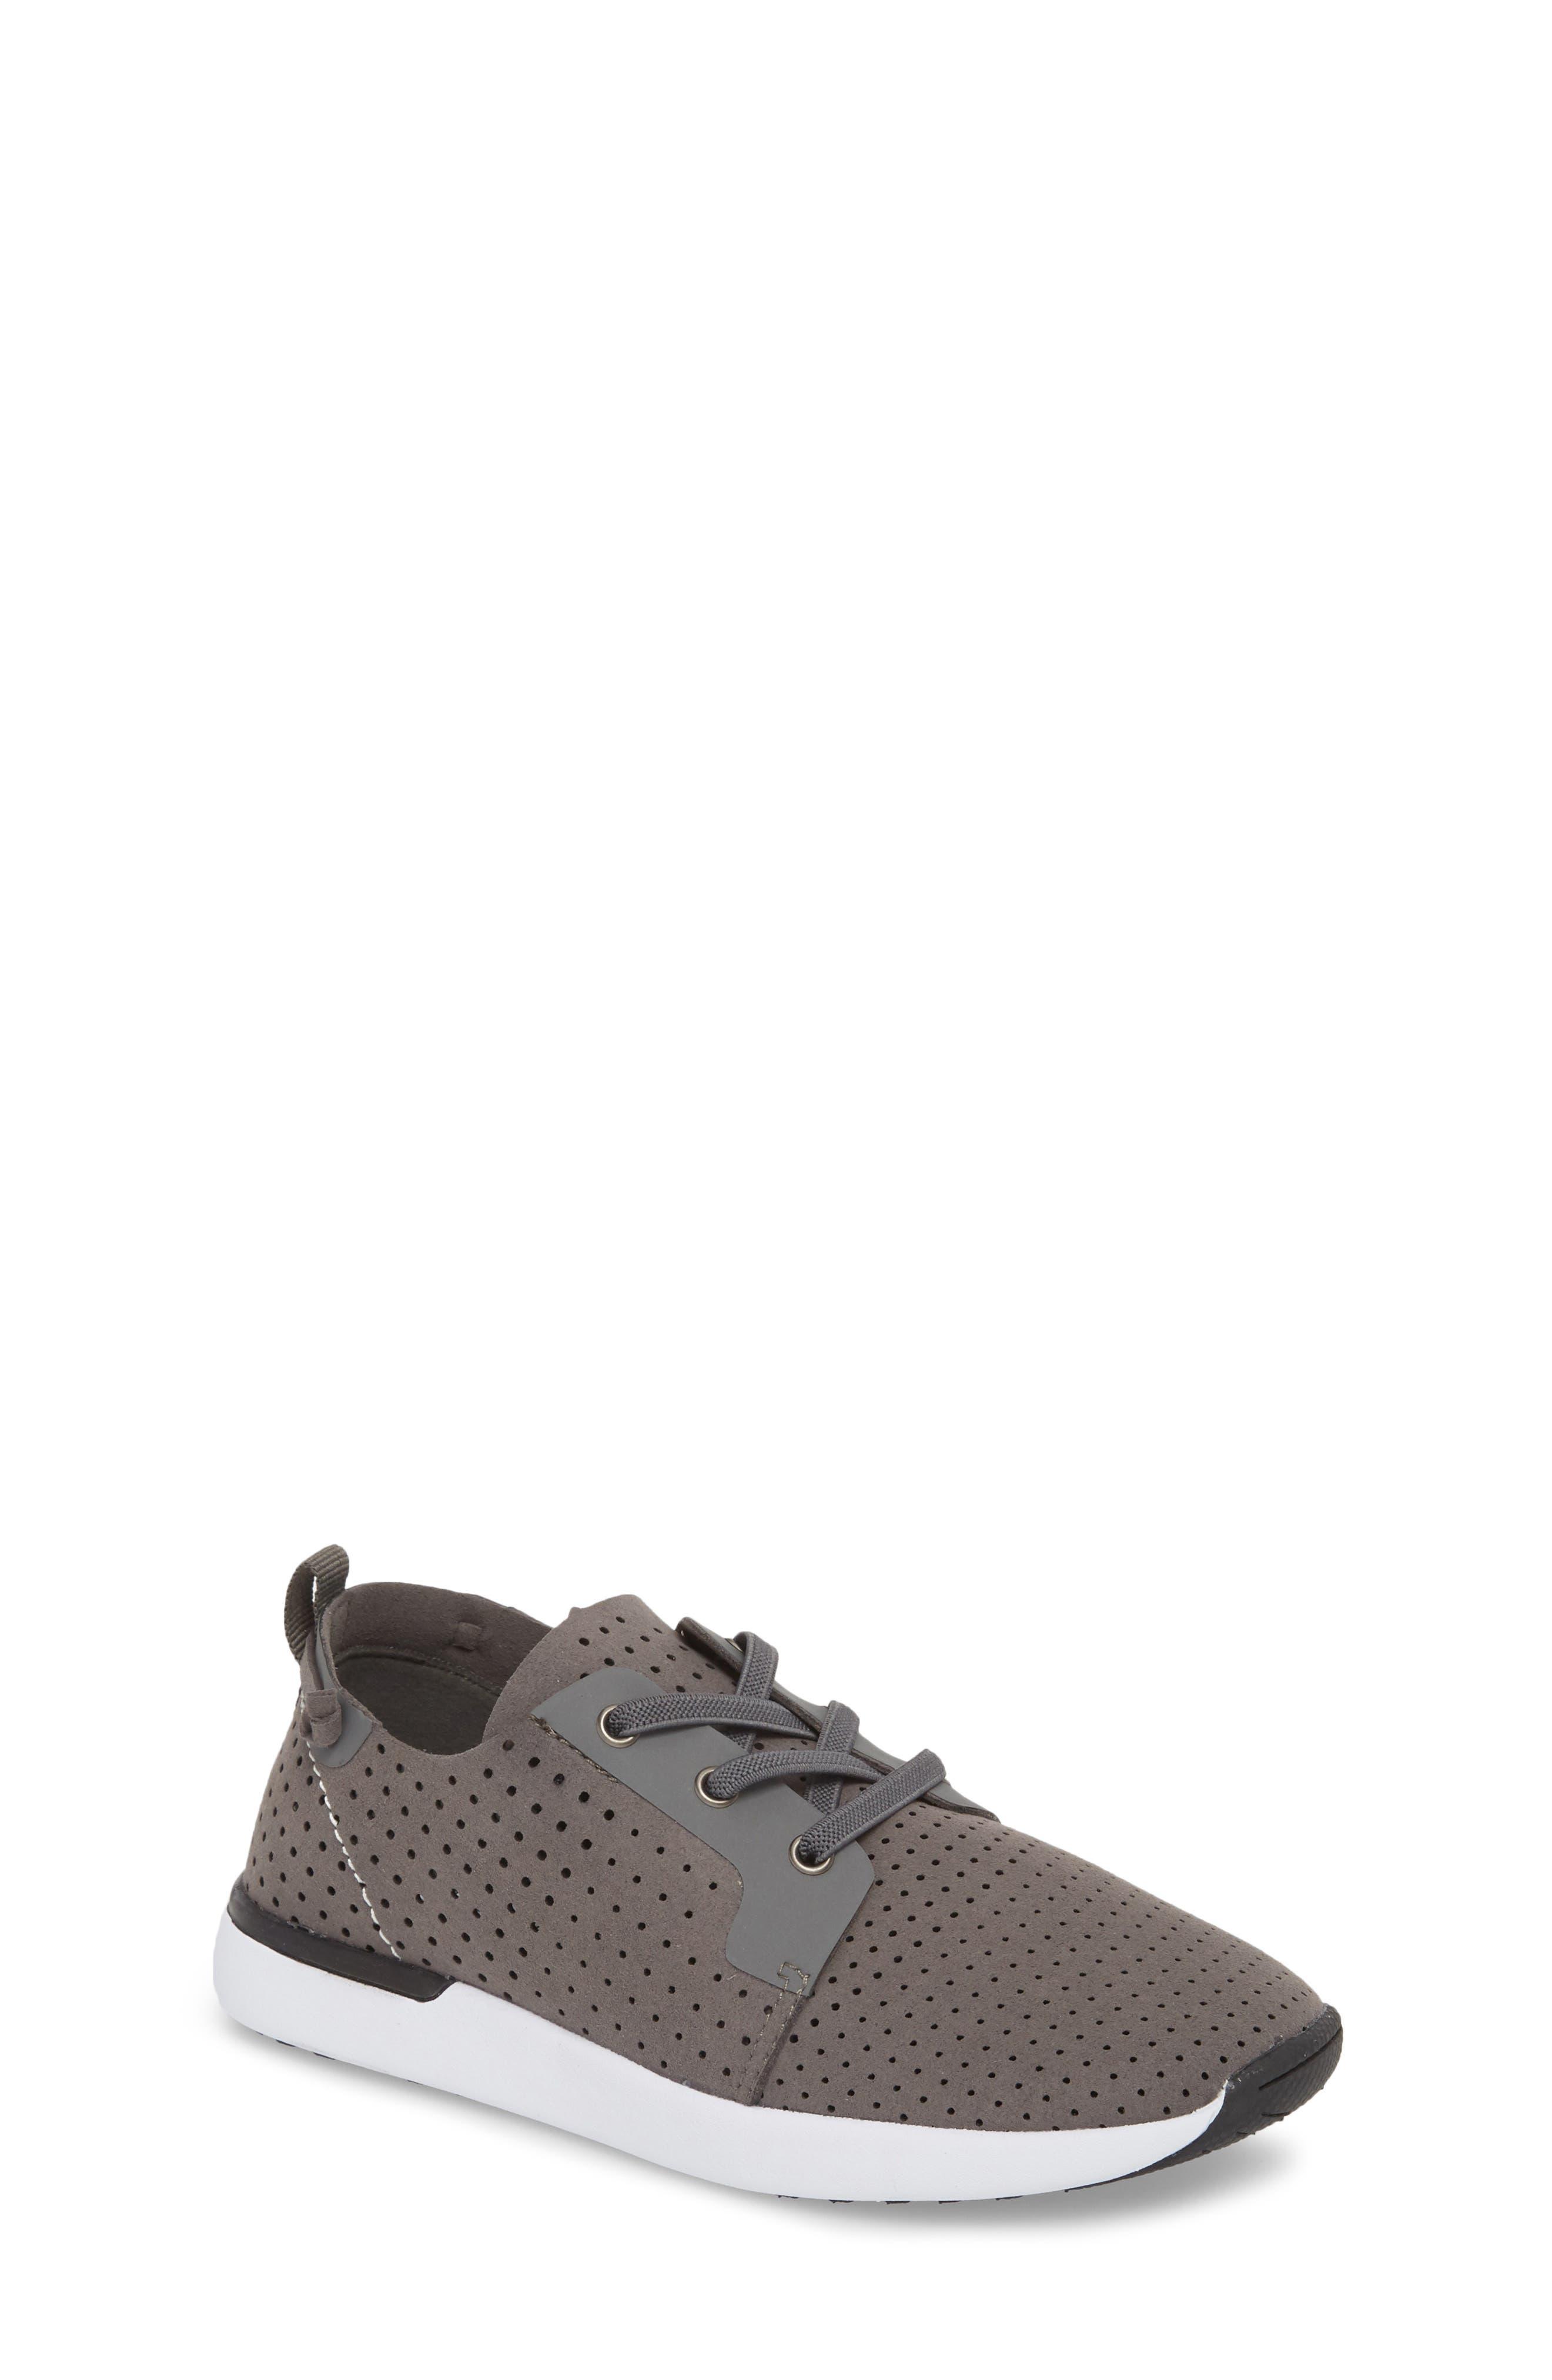 Brixxon Perforated Sneaker,                             Main thumbnail 1, color,                             Grey